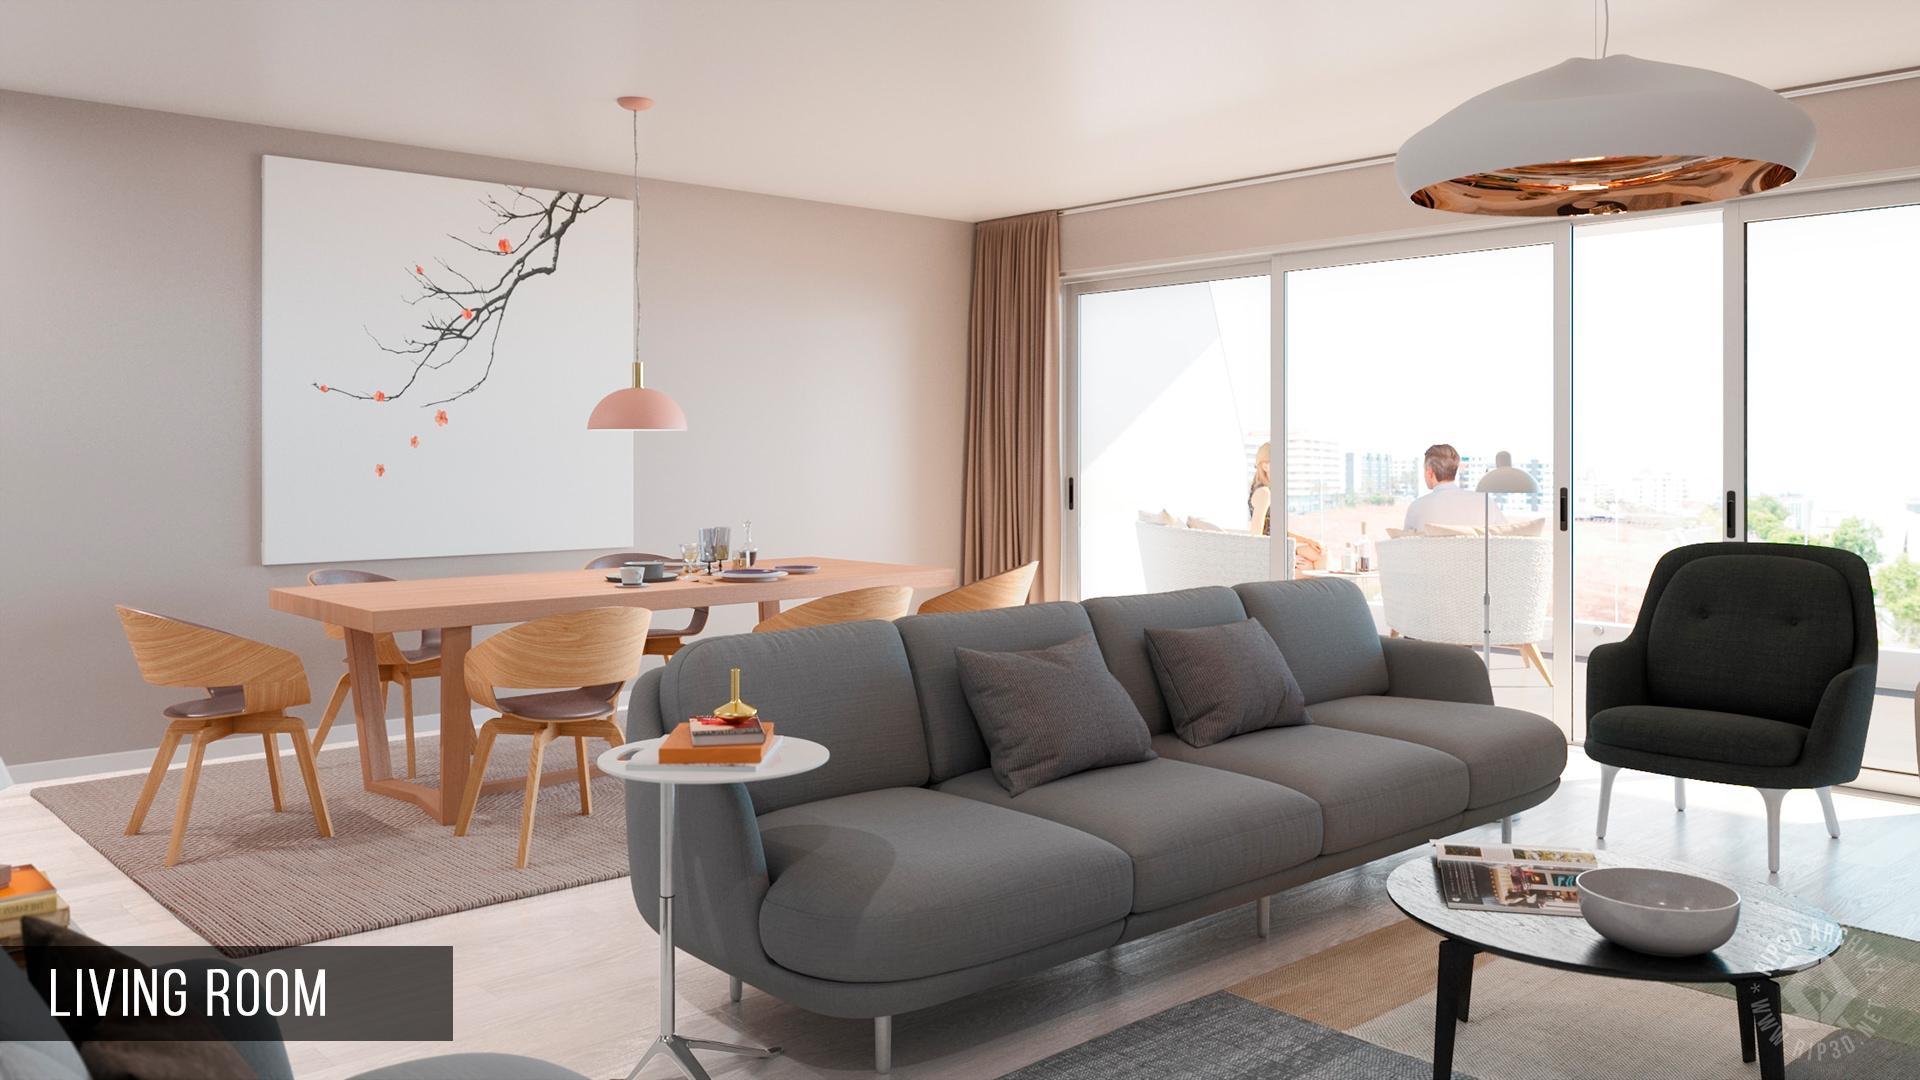 sao lucas residence - living room